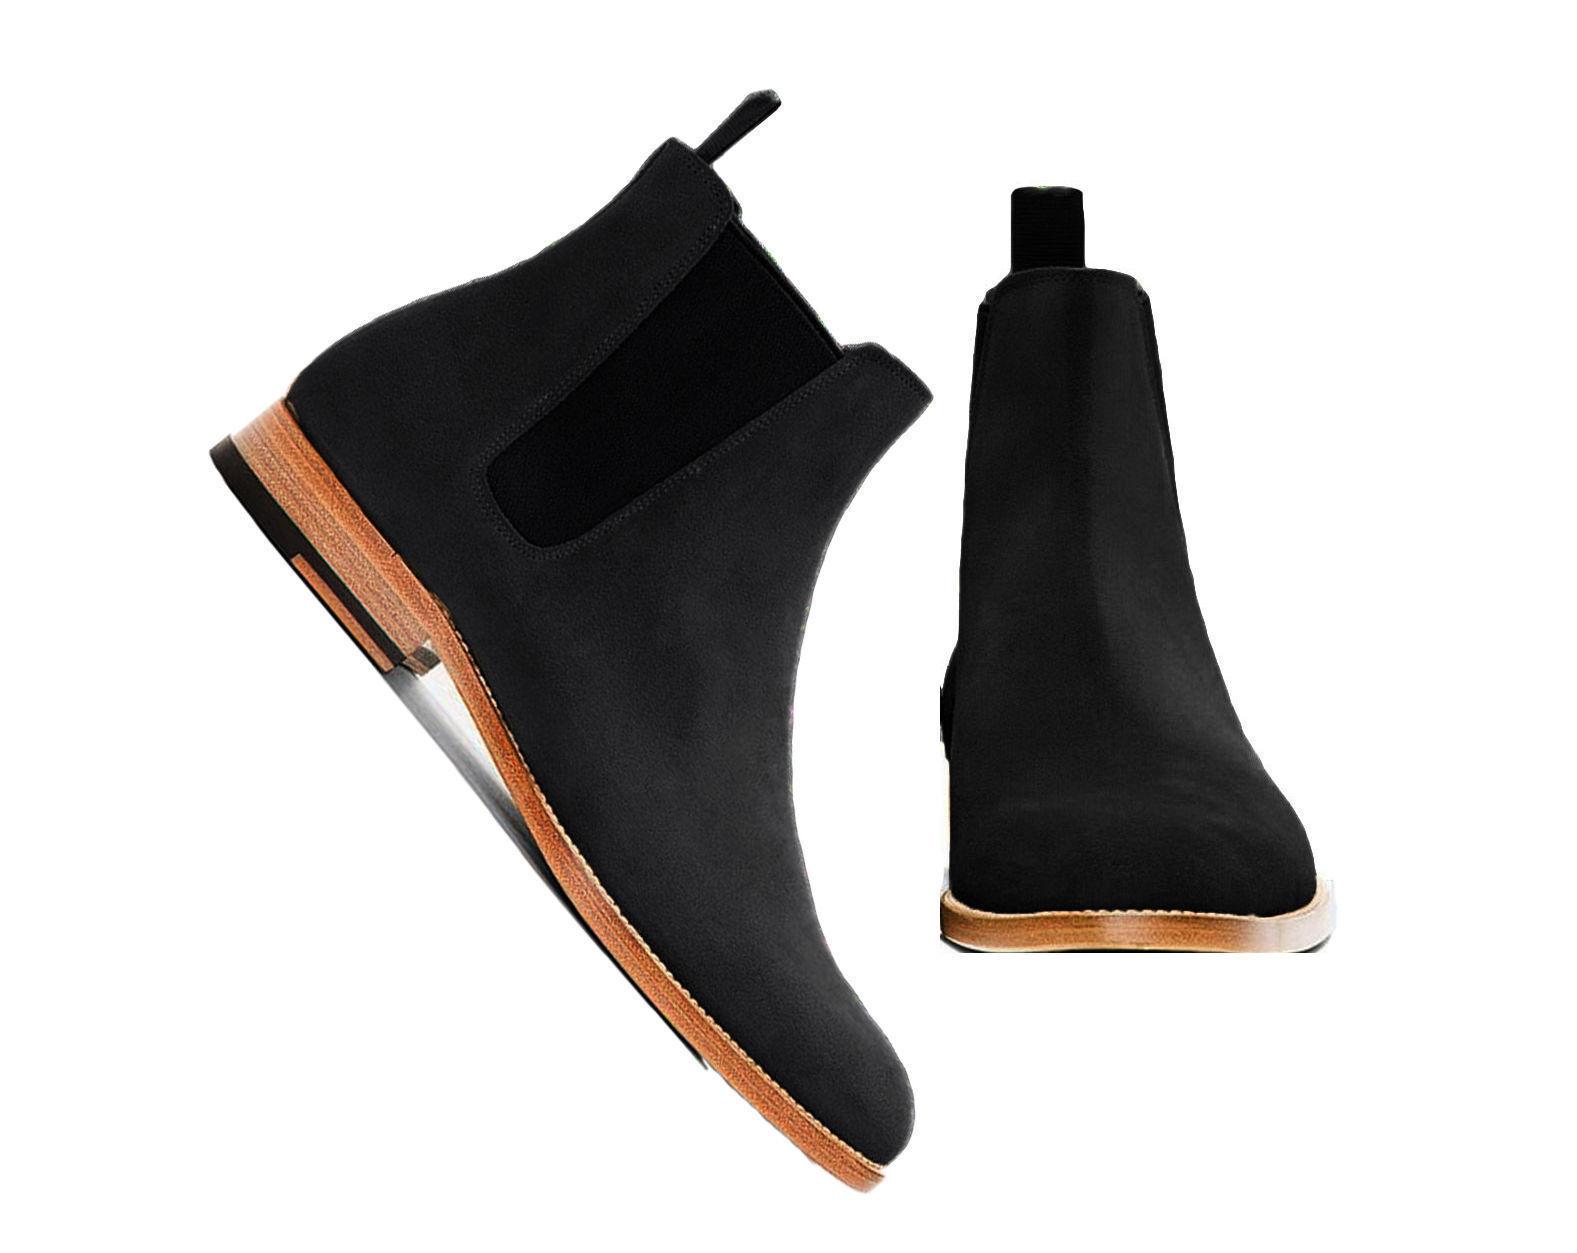 Mens Handmade Handmade Handmade nero Ankle High stivali Suede leather avvio Tailor Made All Dimensione 10f605